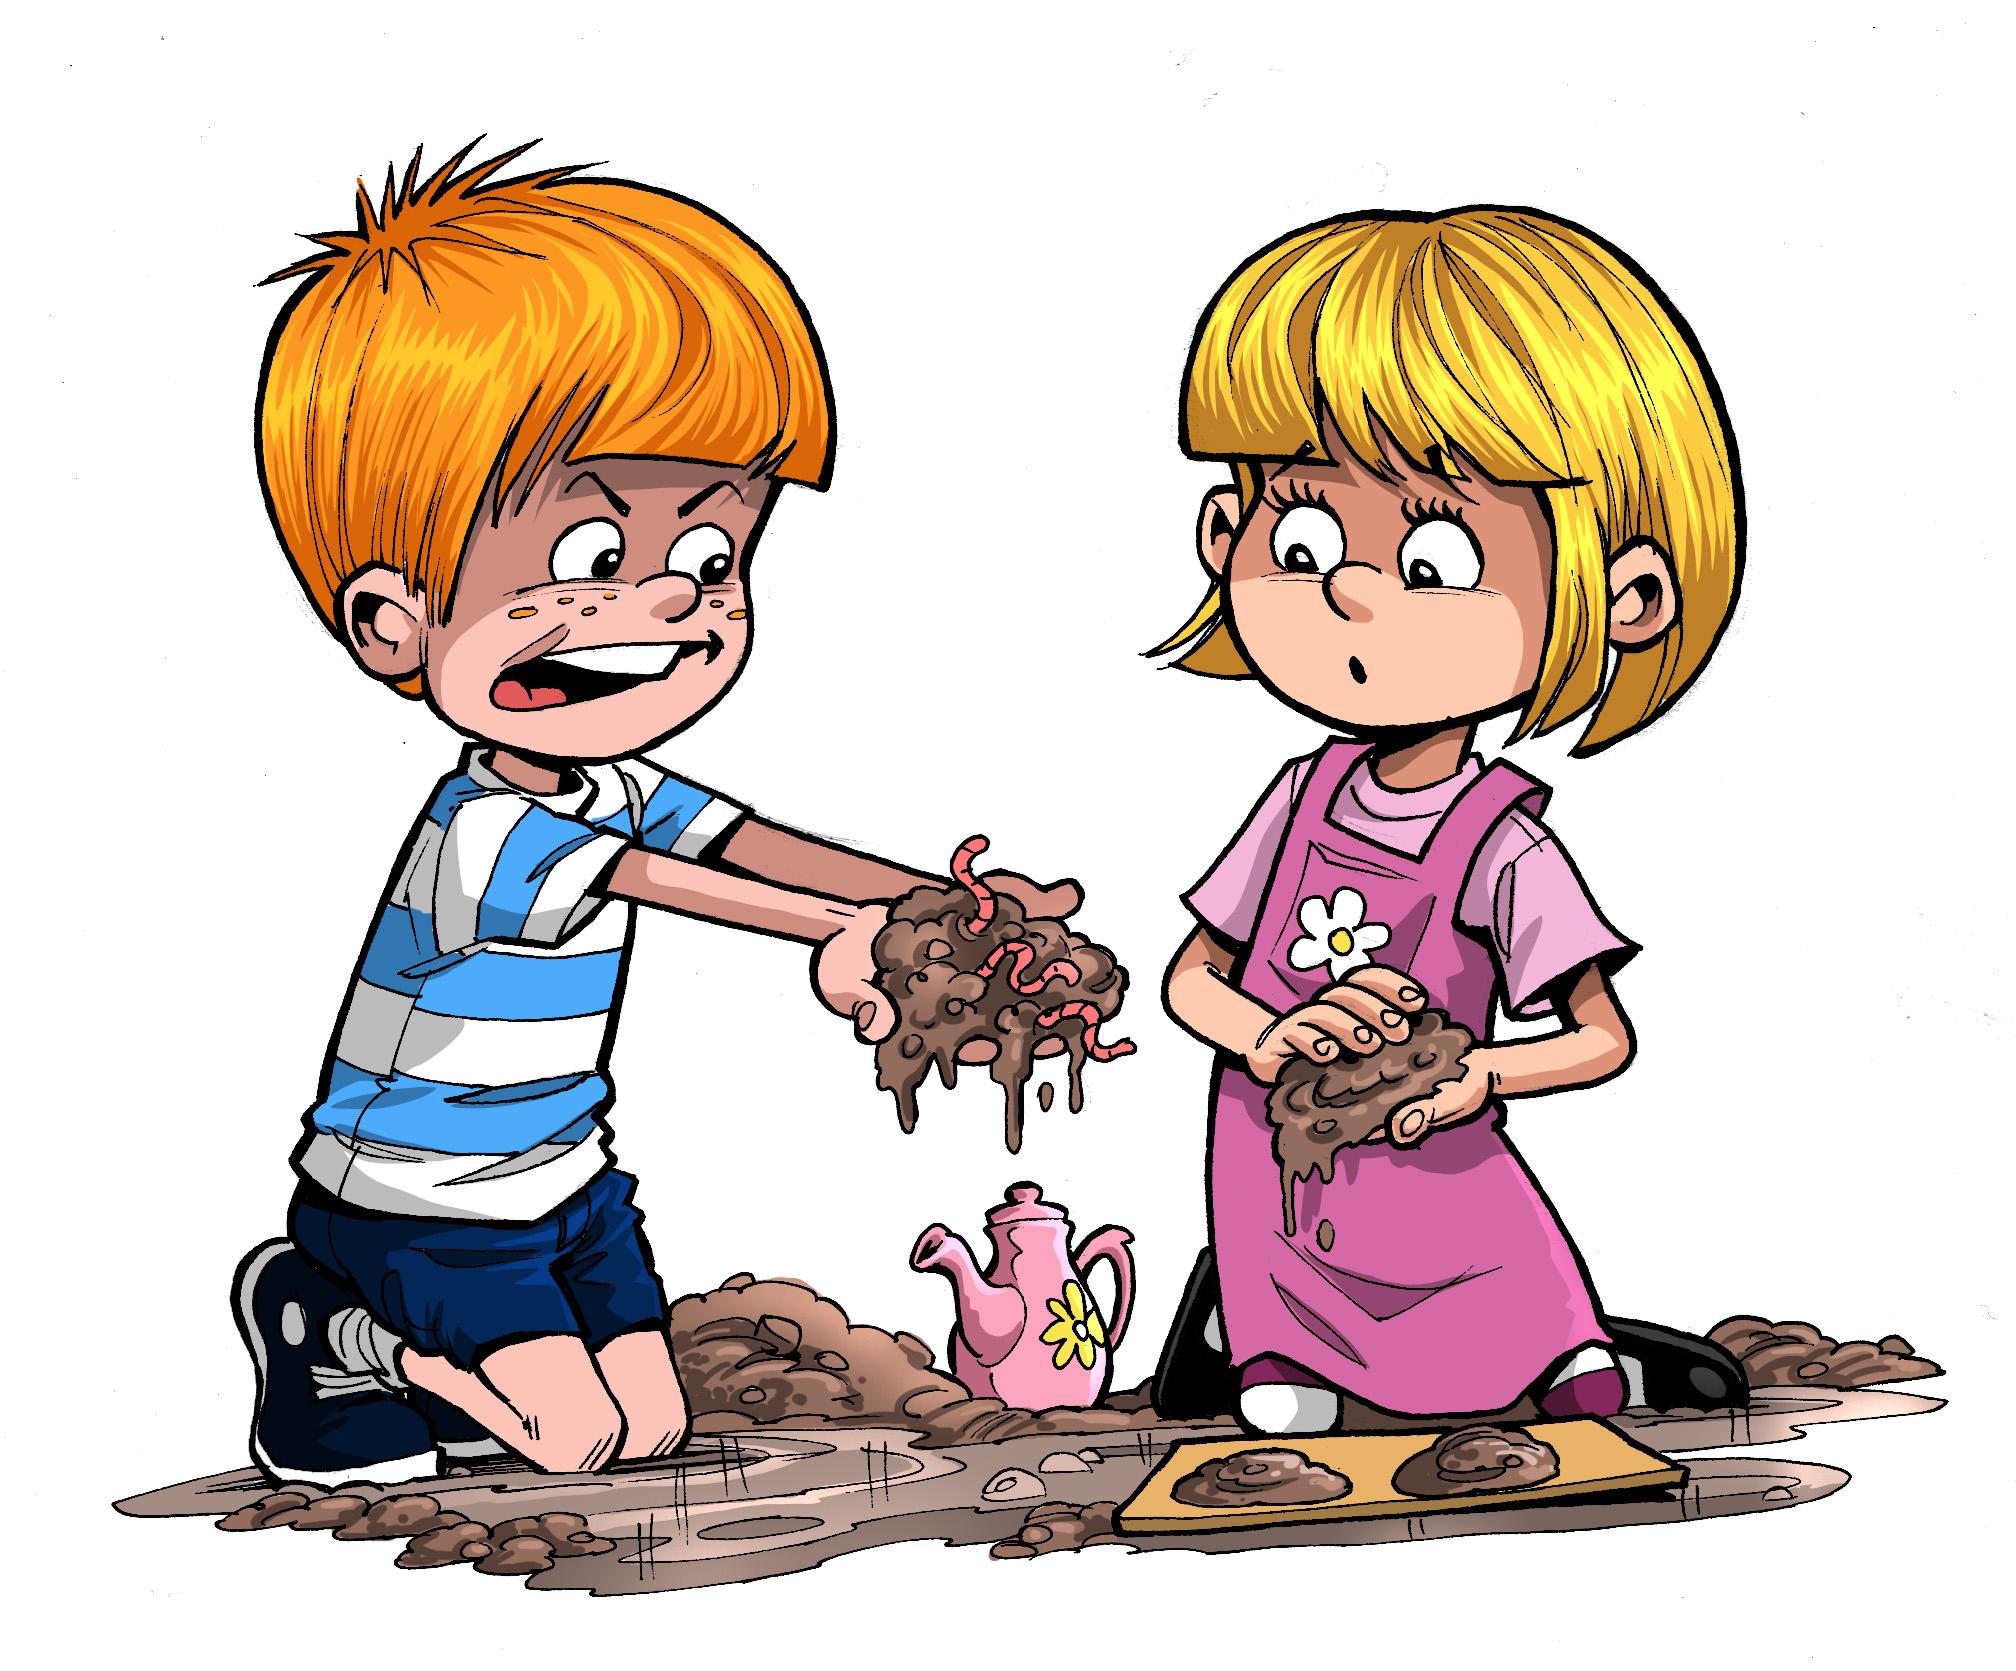 Cartoon Kids Playing With Mud Drawing Free Image